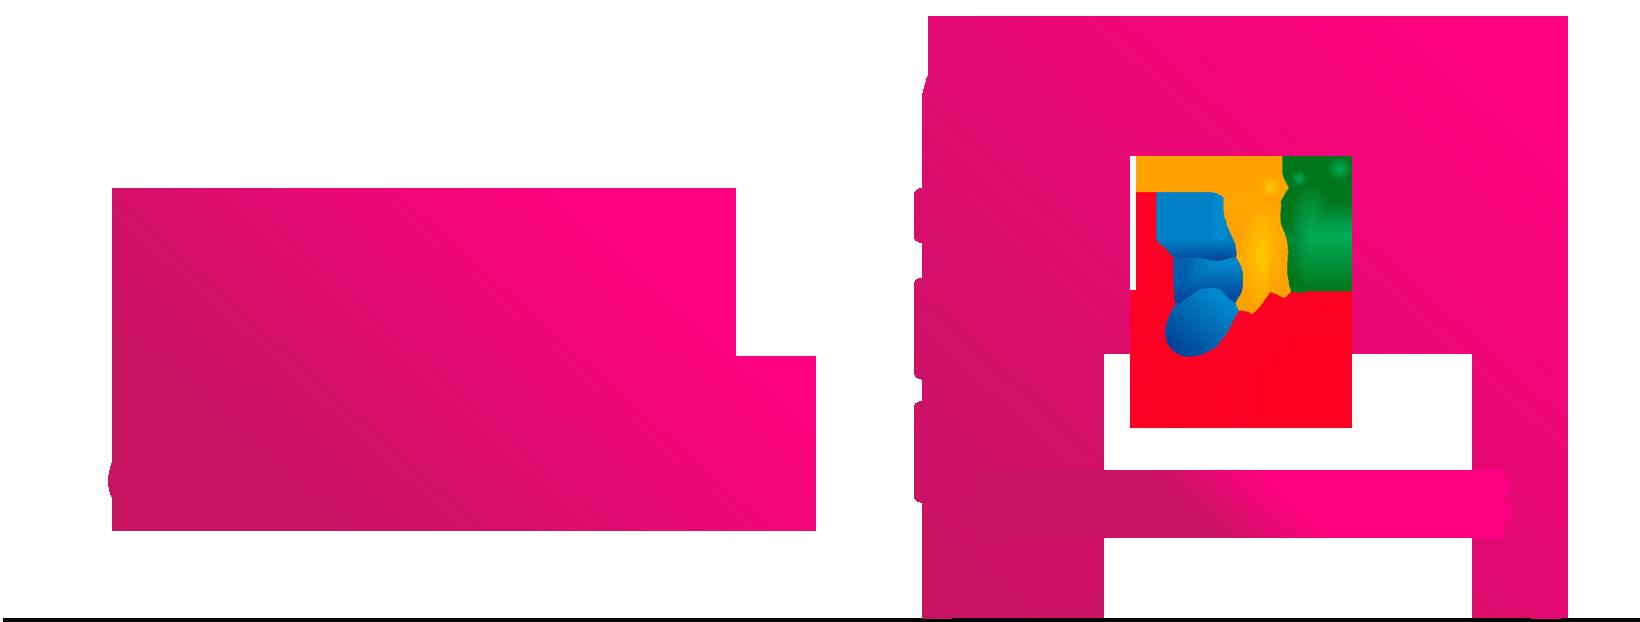 https://xn--29-6kca7ah3bxn0b9a.xn--p1ai/upload/GorLinia.png